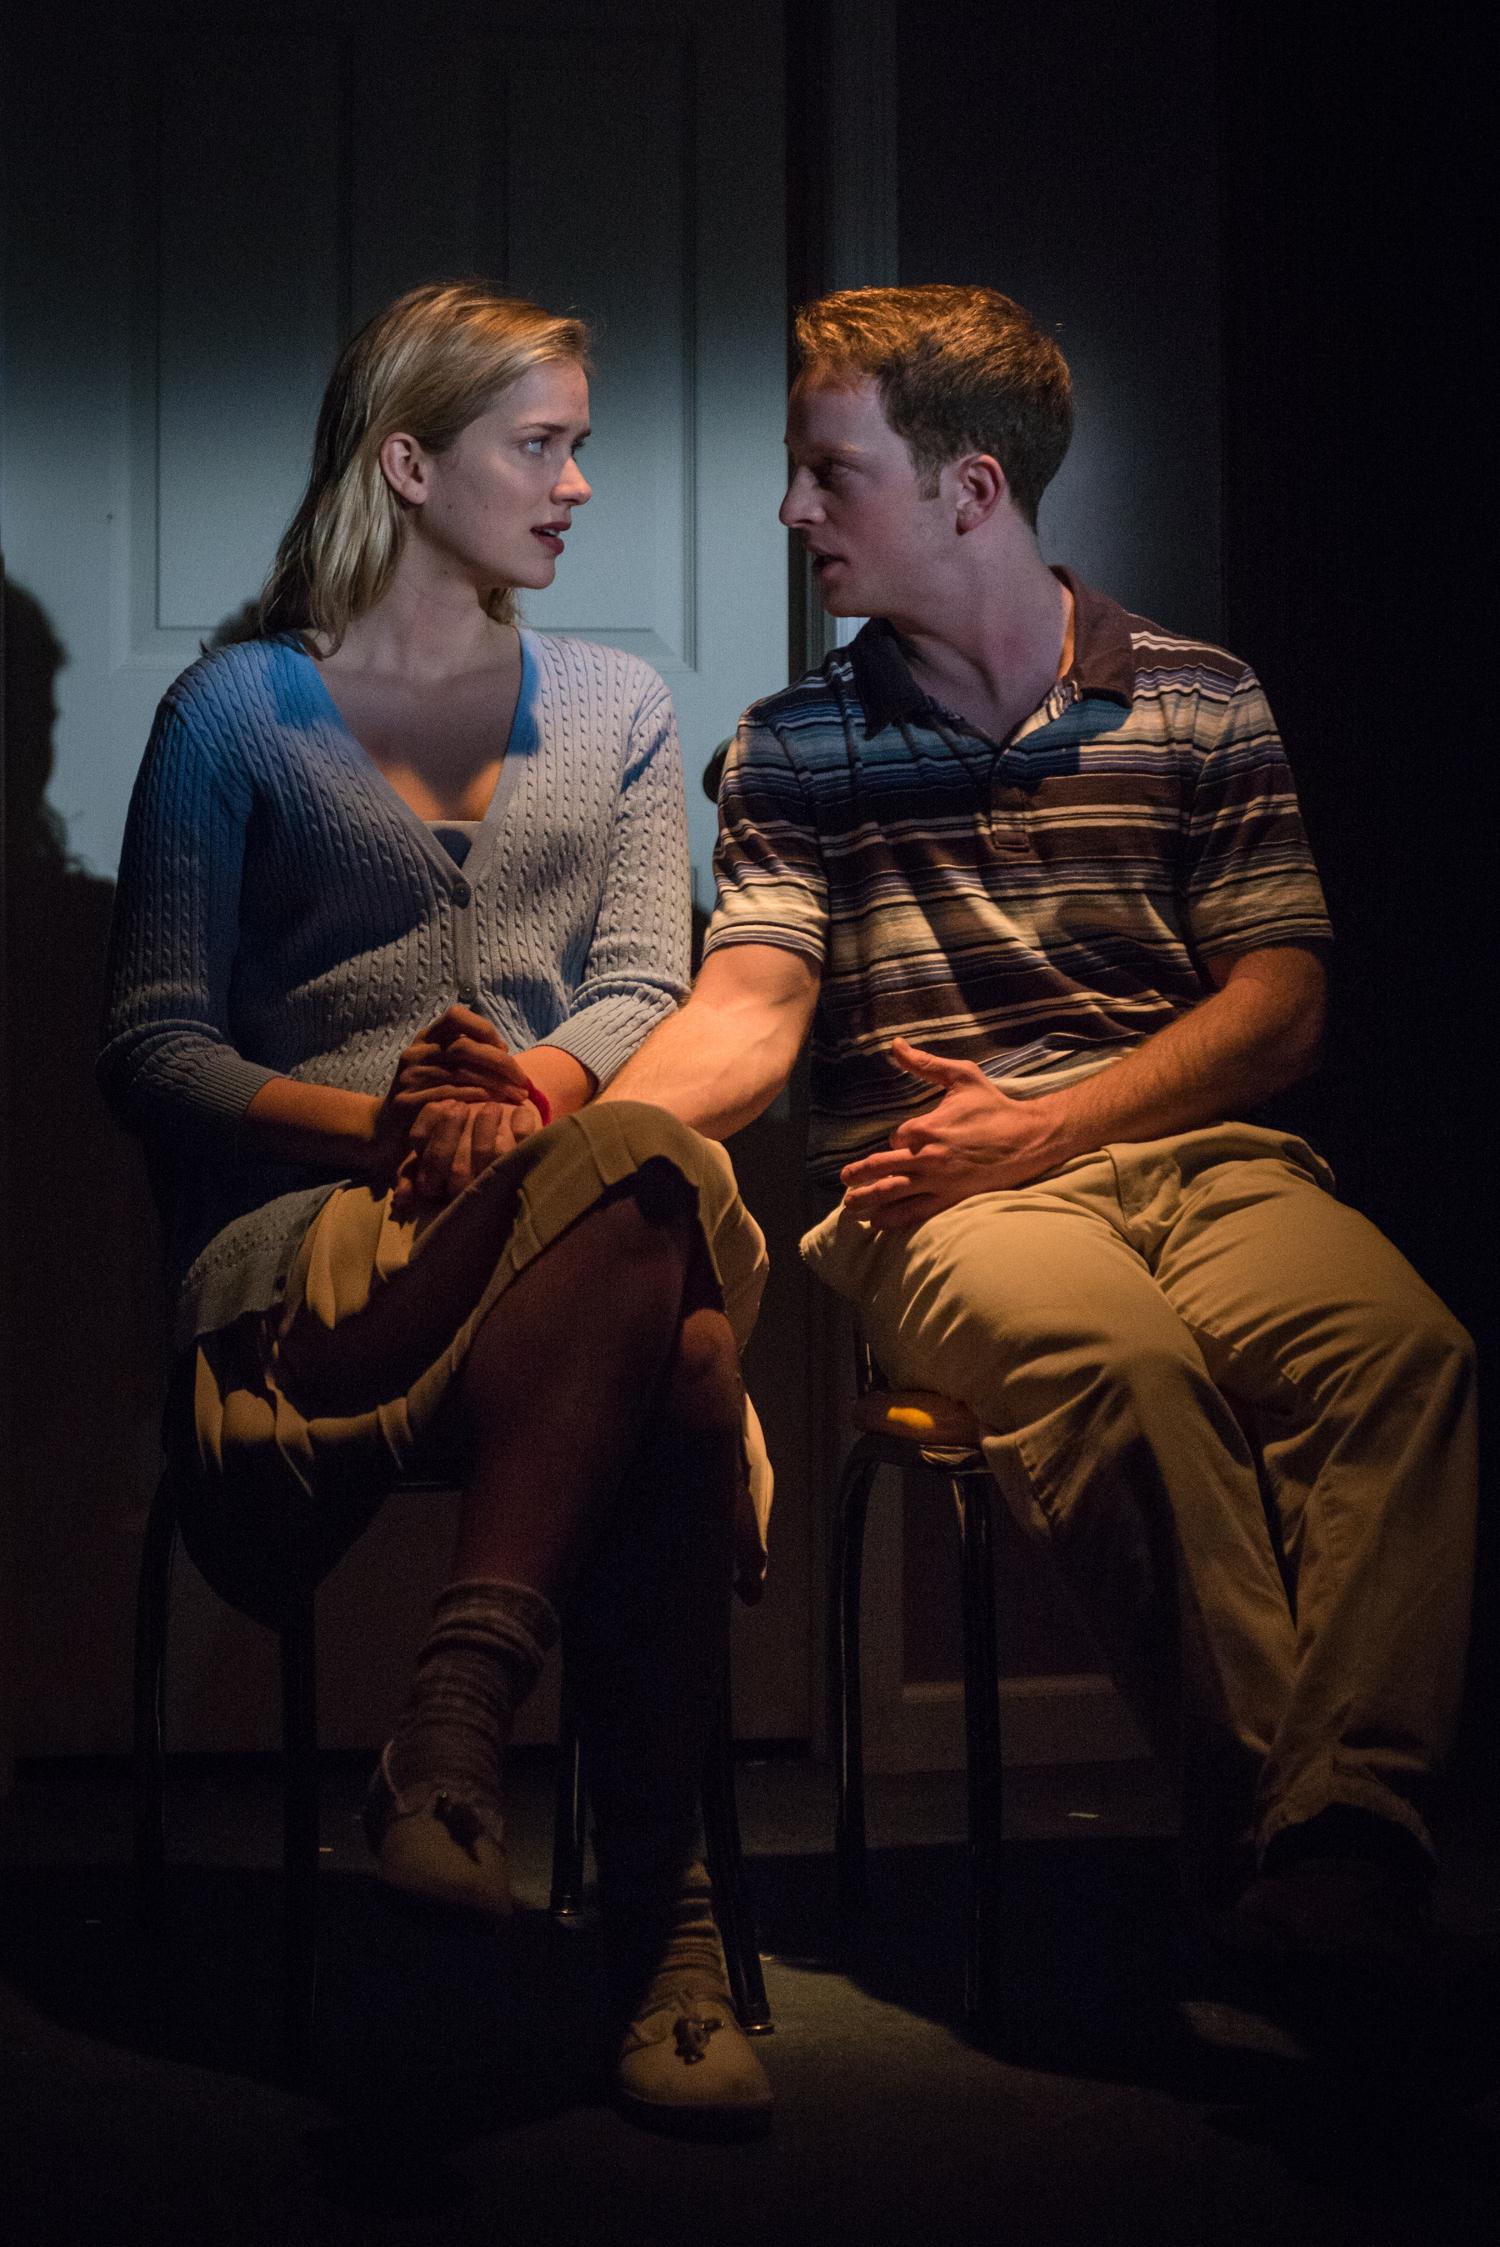 Elizabeth Lail as Hayley, Spencer Davis Milford as Matt. Photo credit: Russ Rowland